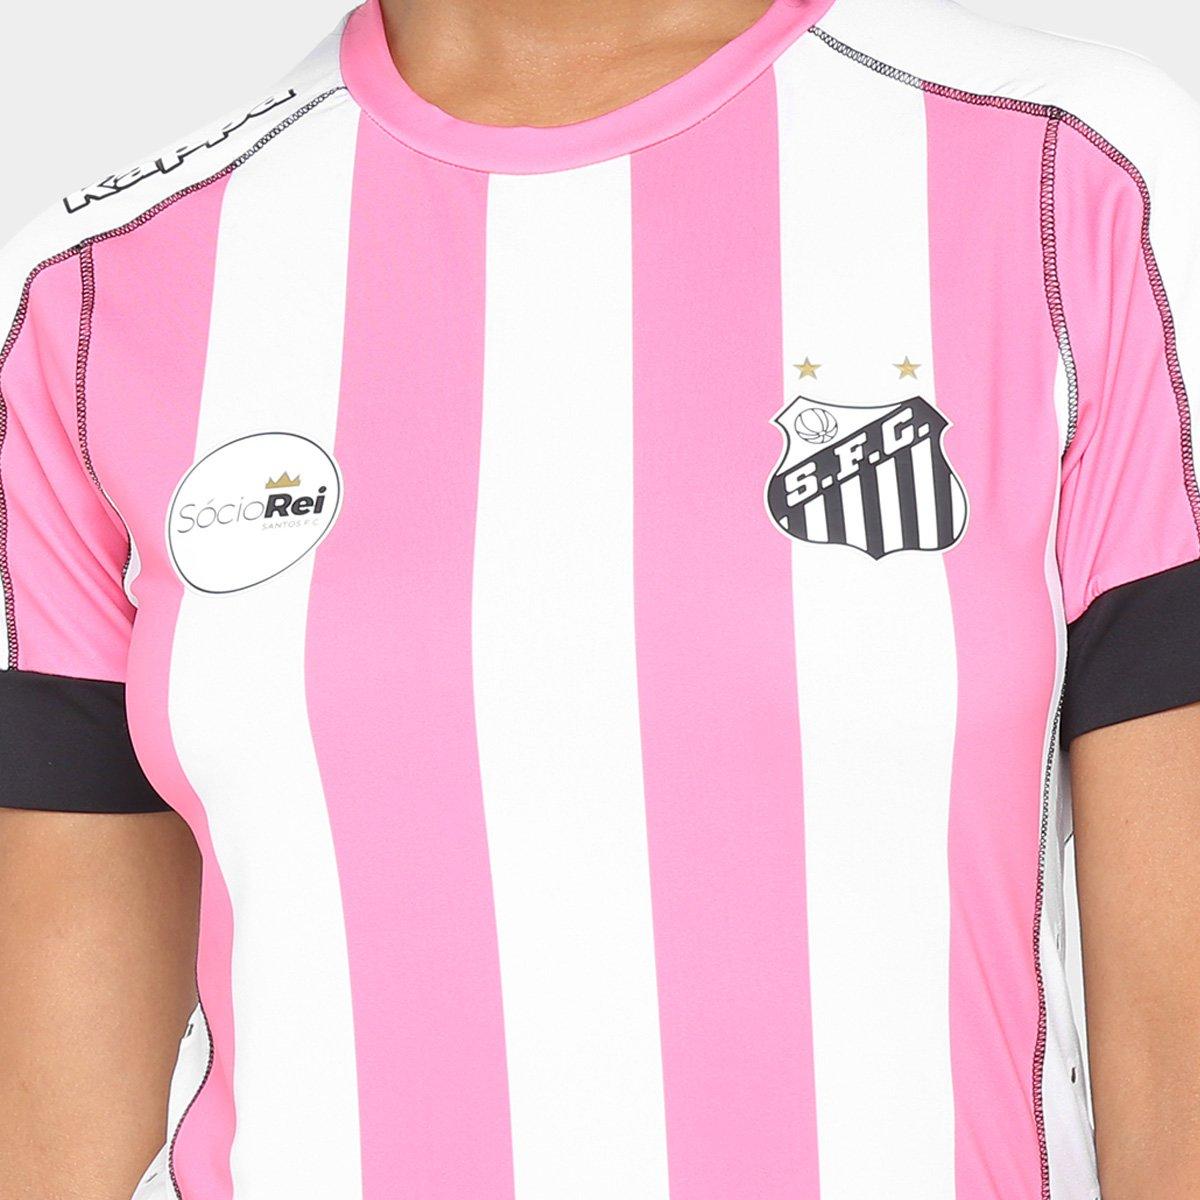 fdeab60bd68d3 Camisa Santos II Outubro Rosa 17 18 s nº Kappa Feminina - Branco e Rosa